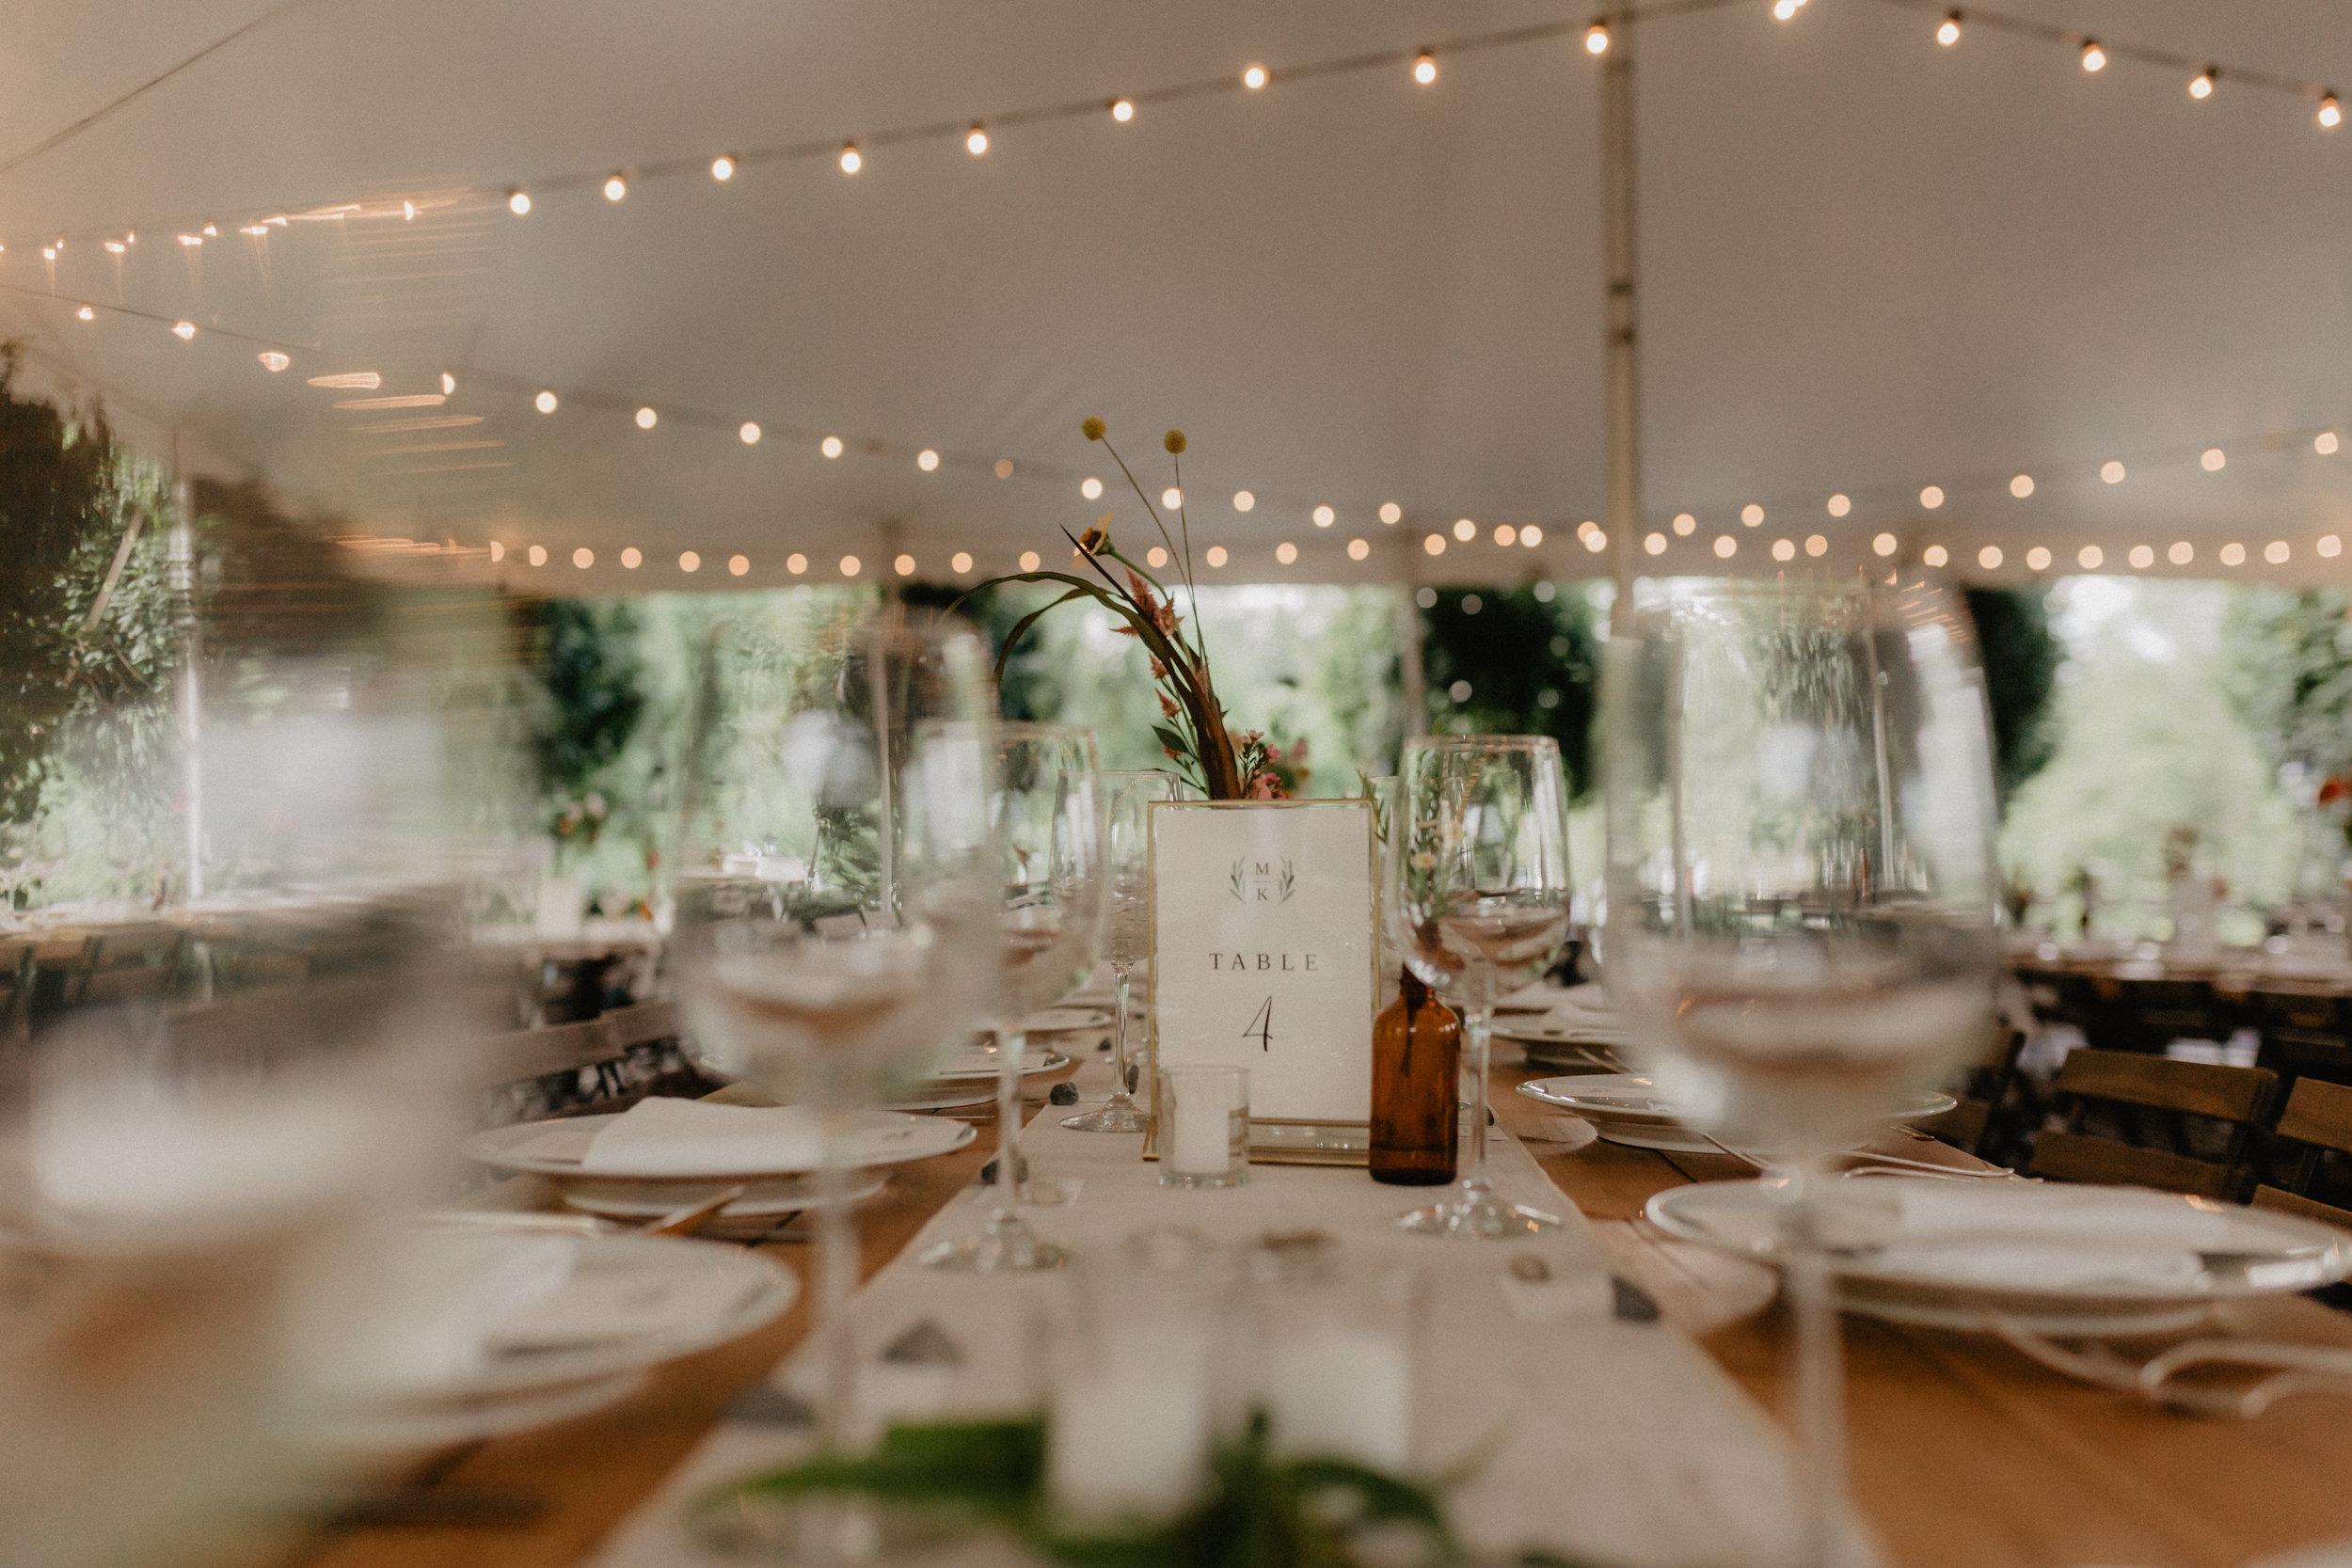 m-and-d-farm-wedding-84.jpg